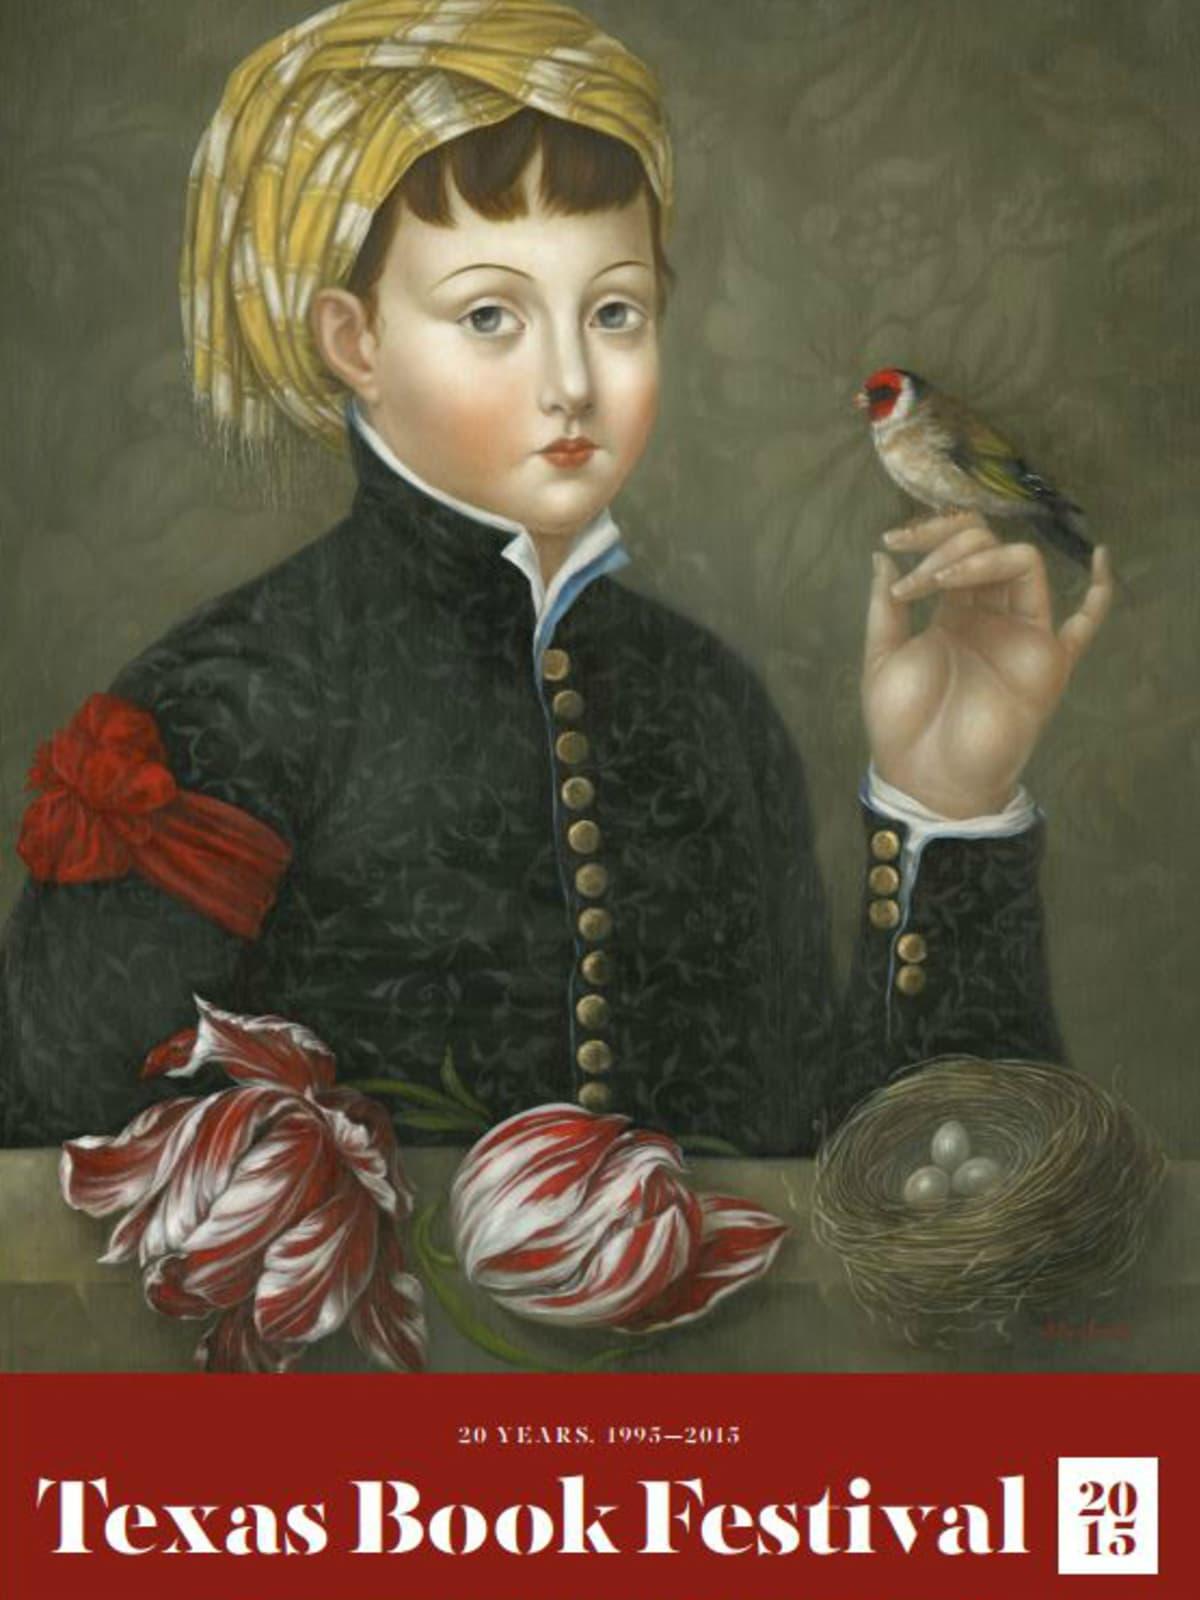 Texas Book Festival 20th anniversary Fatima Ronquillo poster CROPPED 2015